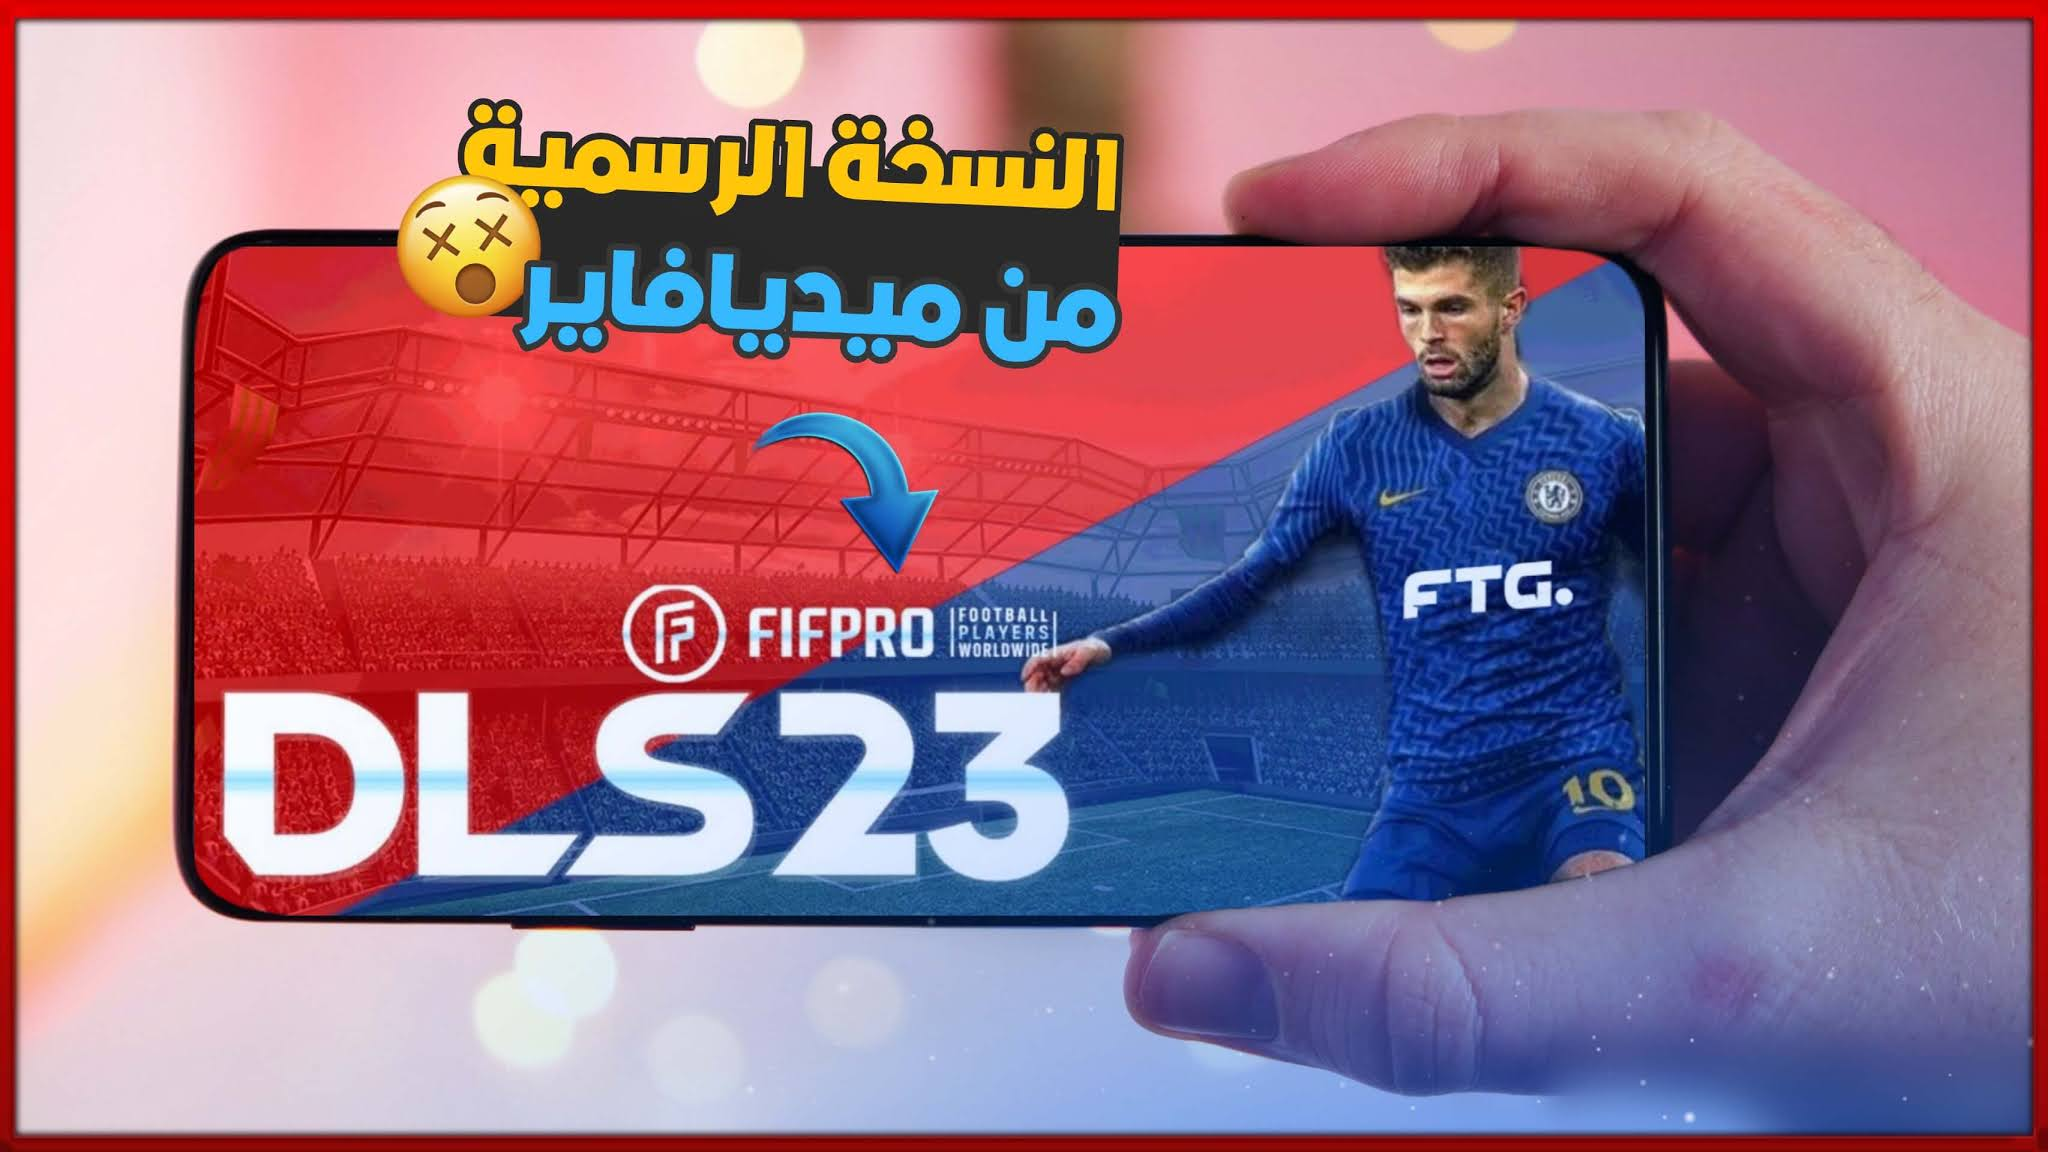 تحميل لعبة دريم ليج سوكر 2023 Dream League Soccer من ميديا فاير بجرافيك عالي (اوفلاين + اونلاين) | DLS 23